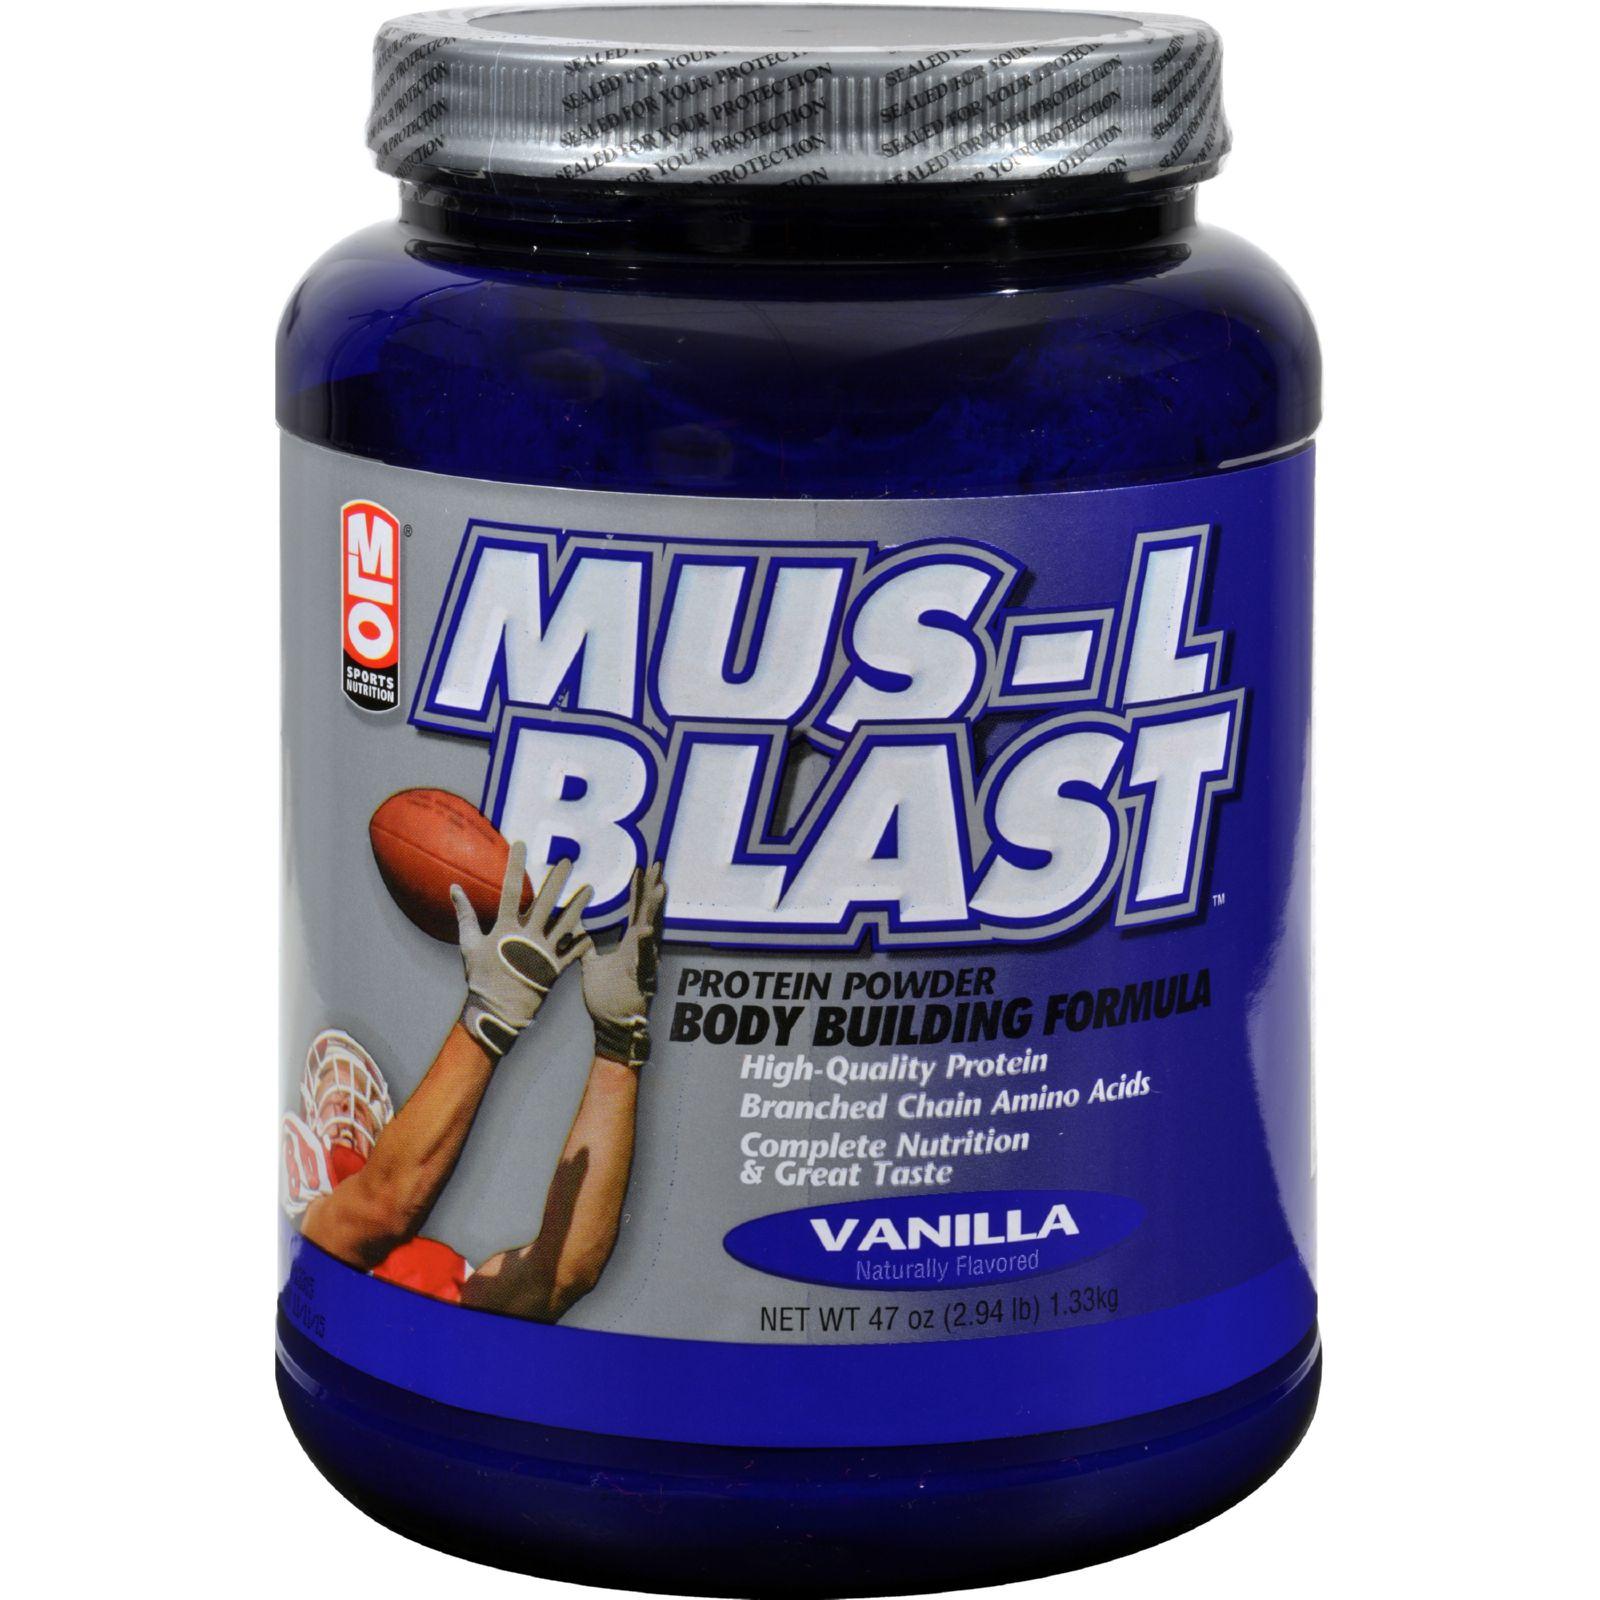 Mlo Mus-l-blast - Vanilla - 47 Oz